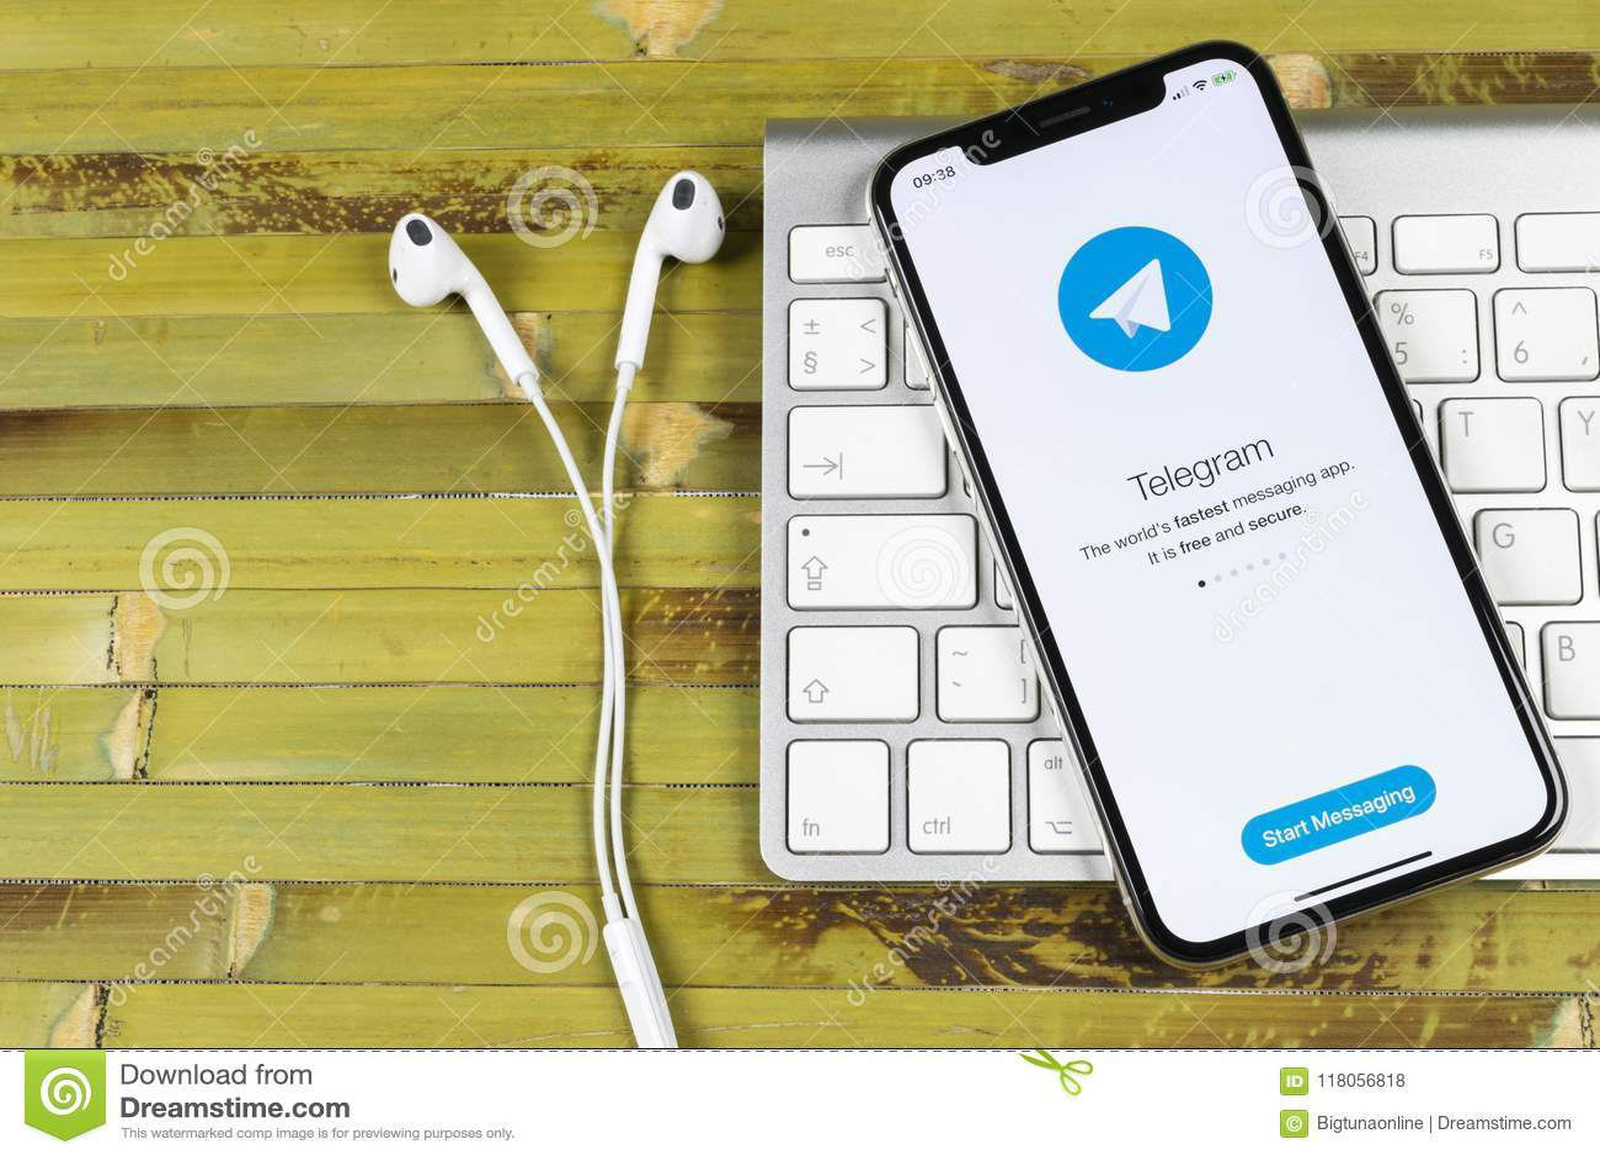 download telegram app for apple